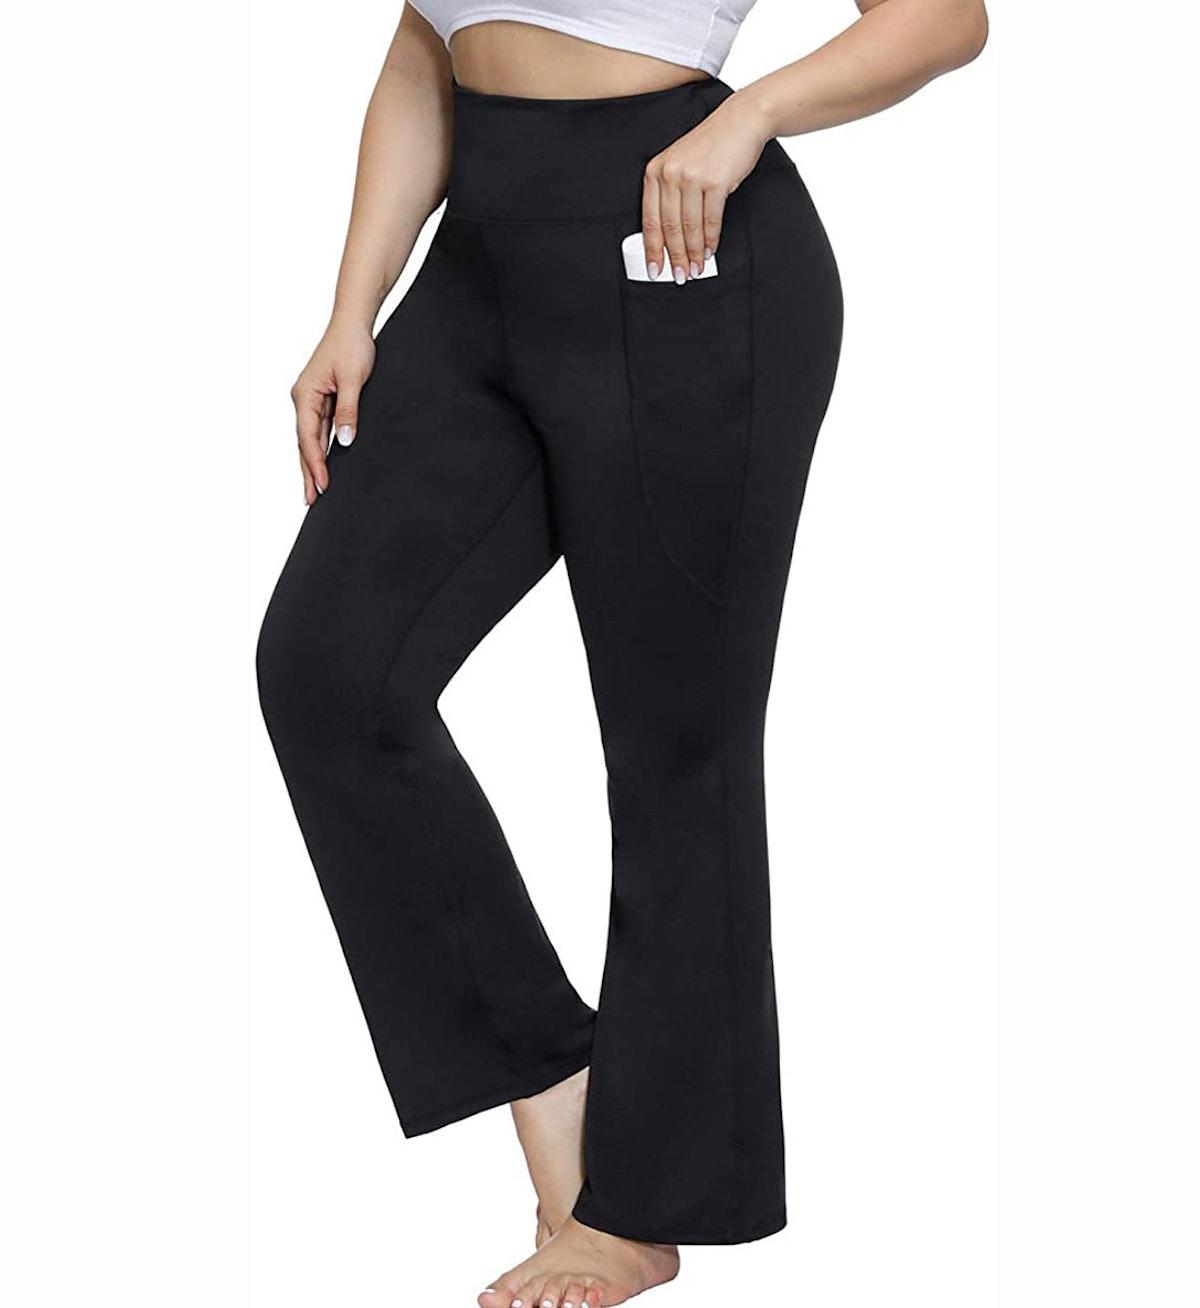 Hanna Nikole Plus Size Bootcut Yoga Pants